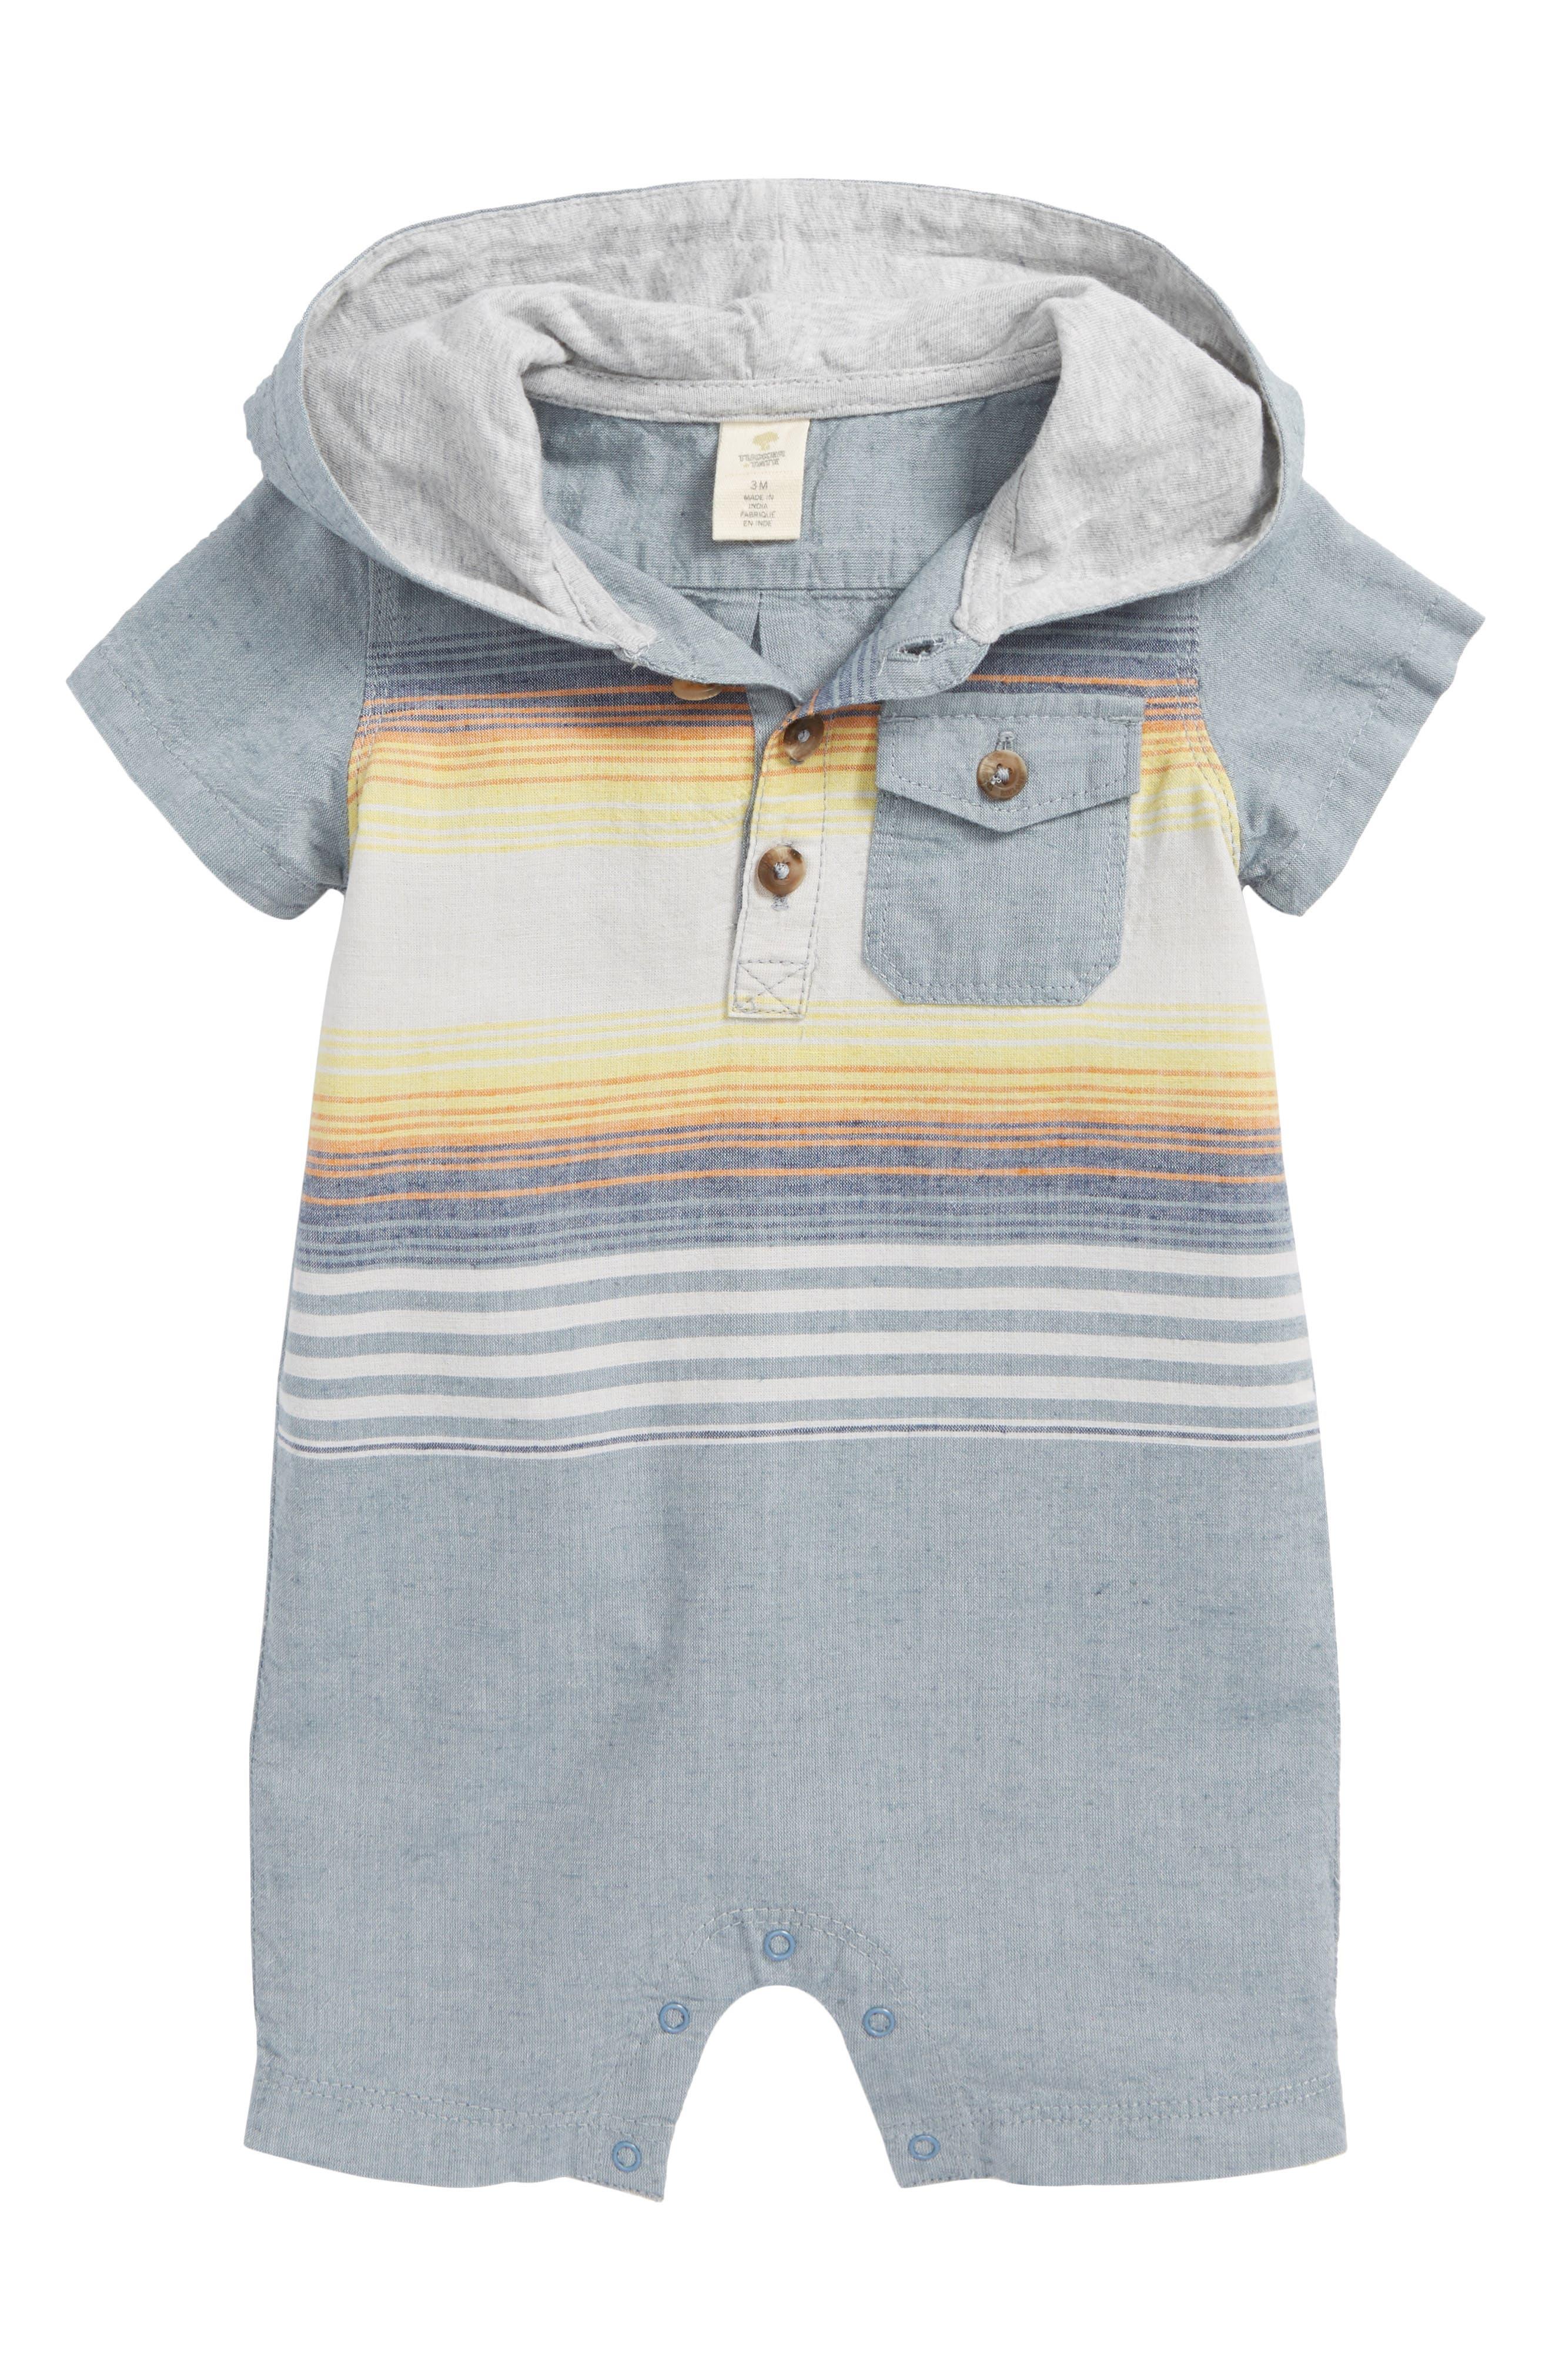 Stripe Hooded Romper,                         Main,                         color, Blue Chambray Sunset Stripe